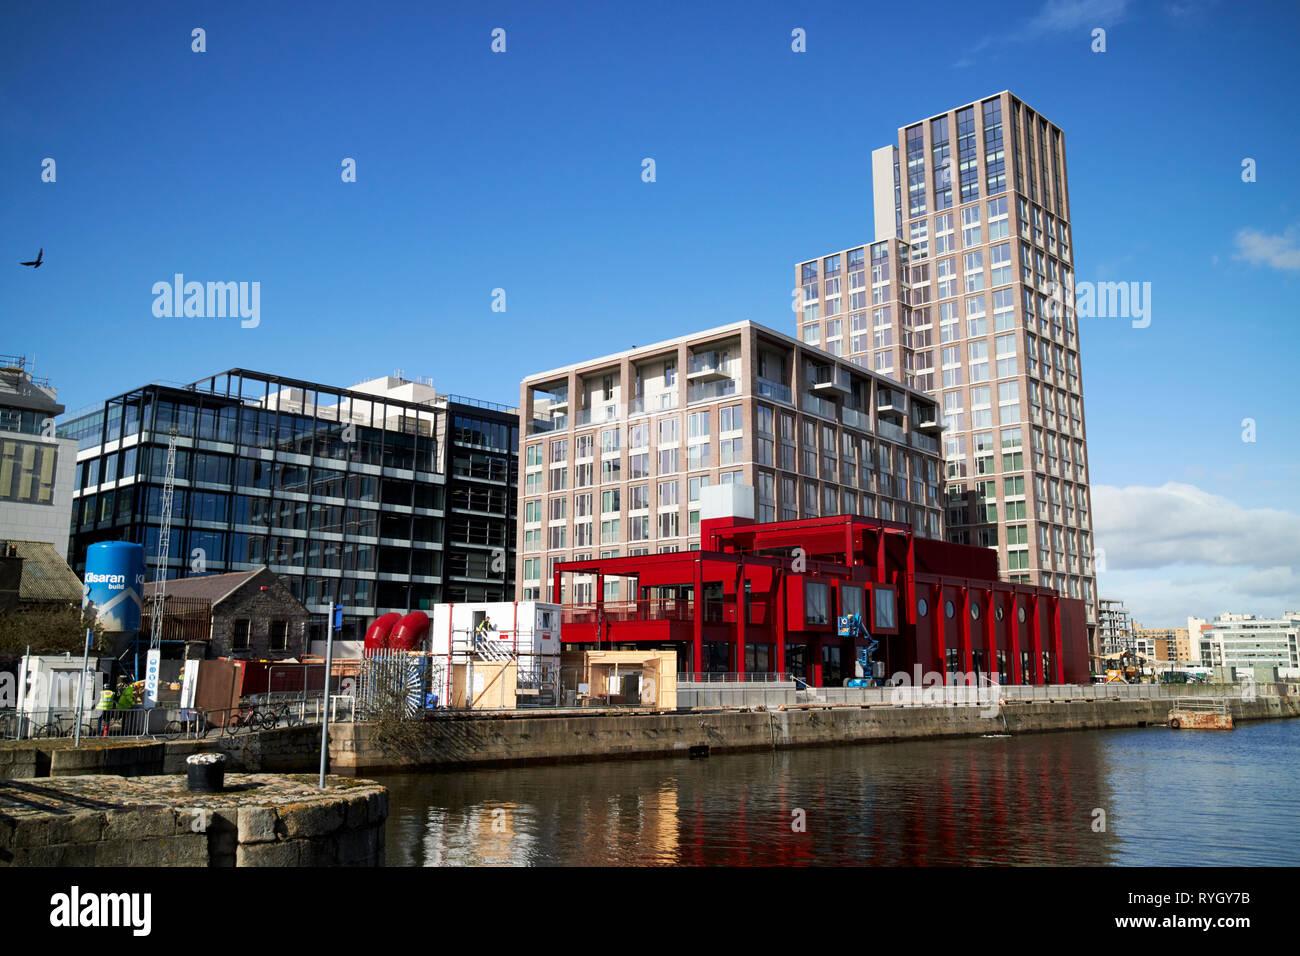 capital dock including capital dock tower in dublins docklands dublin 2 Dublin Republic of Ireland Europe - Stock Image